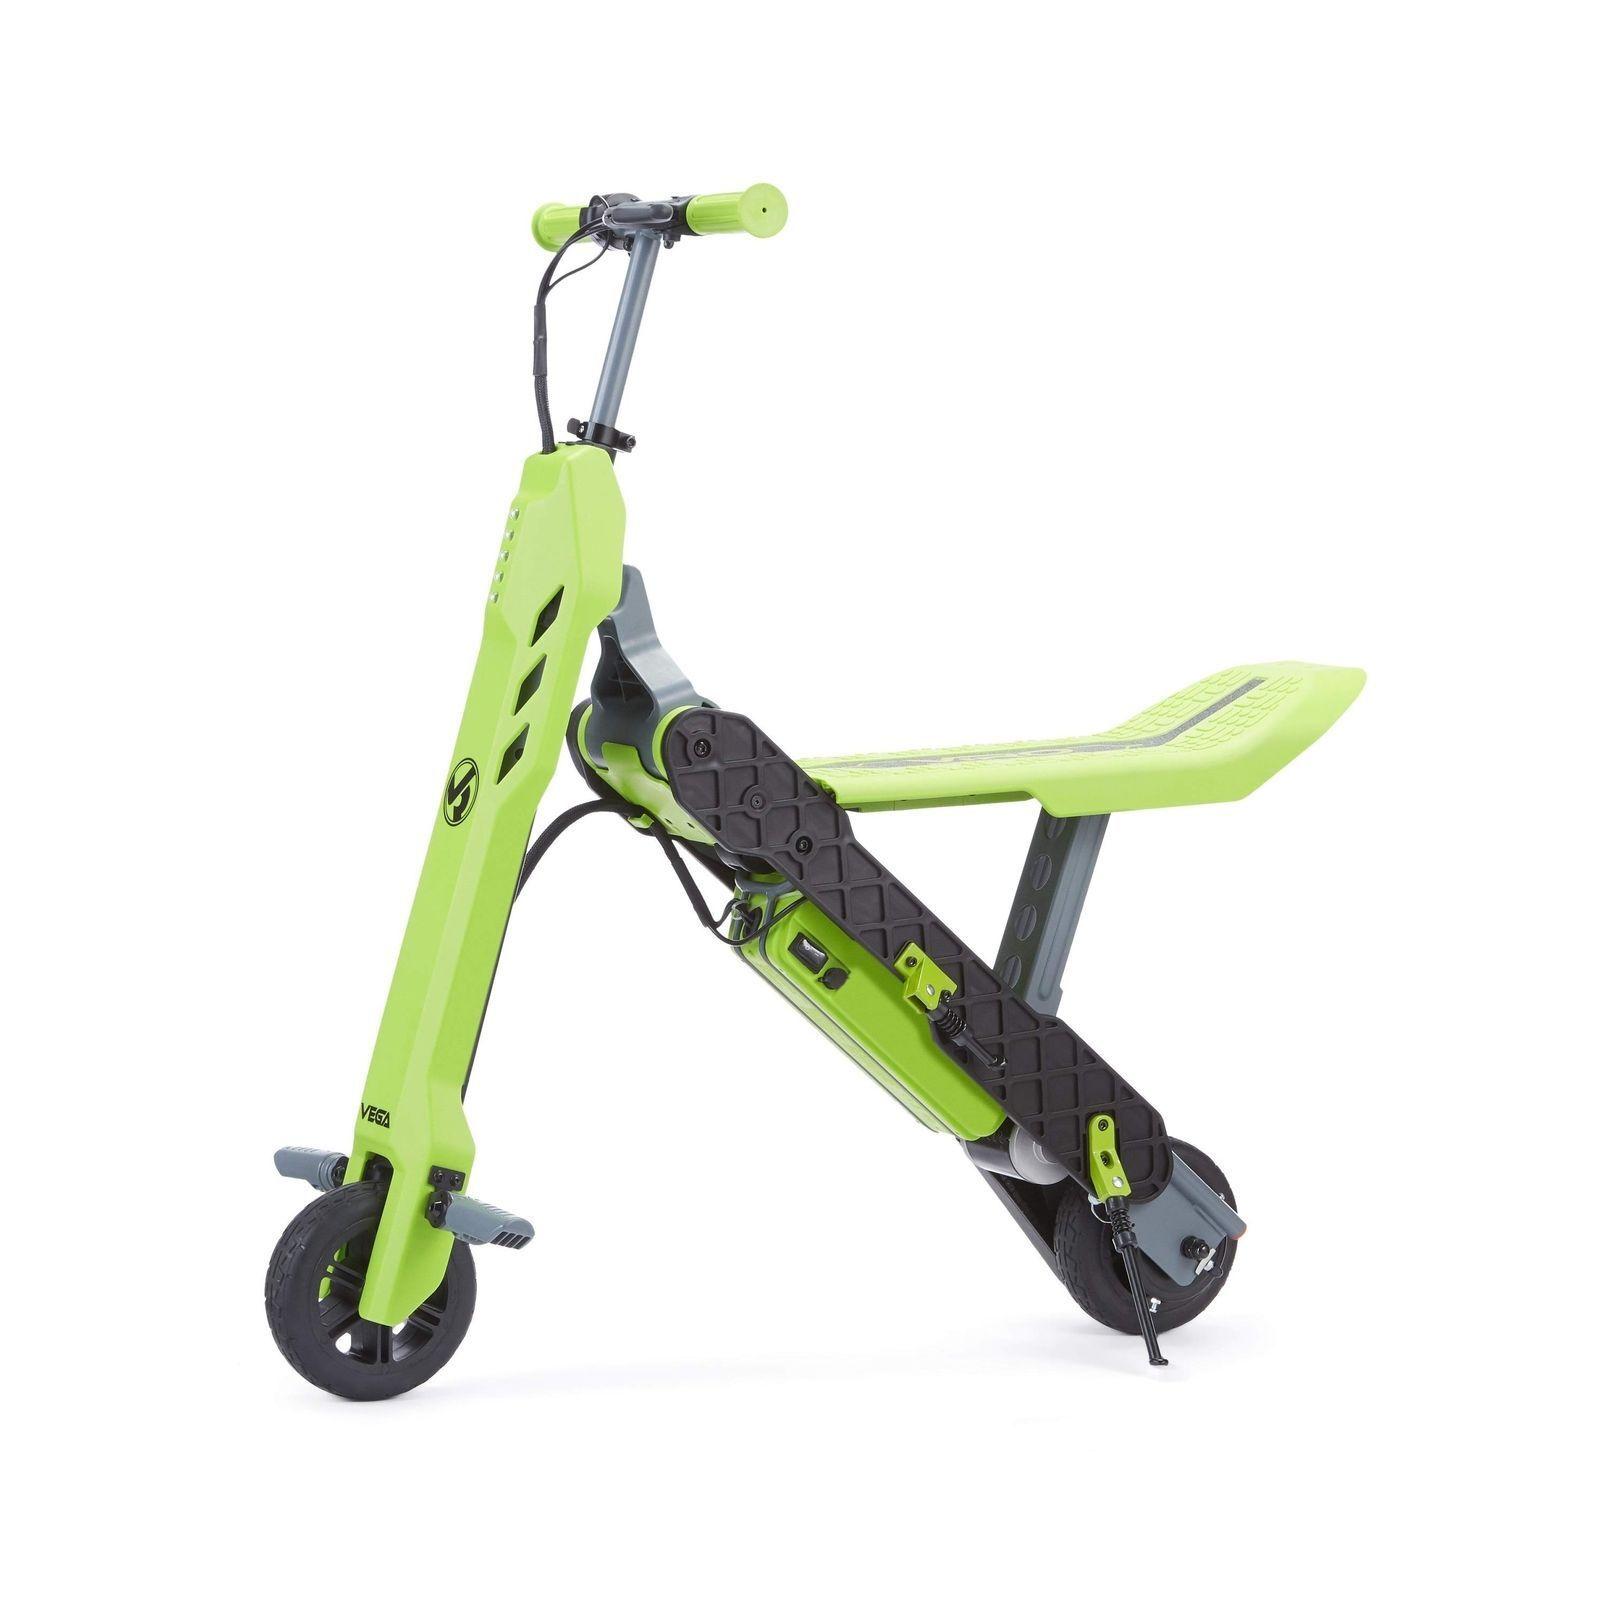 VIRO Rides Vega Transforming 2-in-1 Electric Scooter and Mini Bike UL 2272(used)